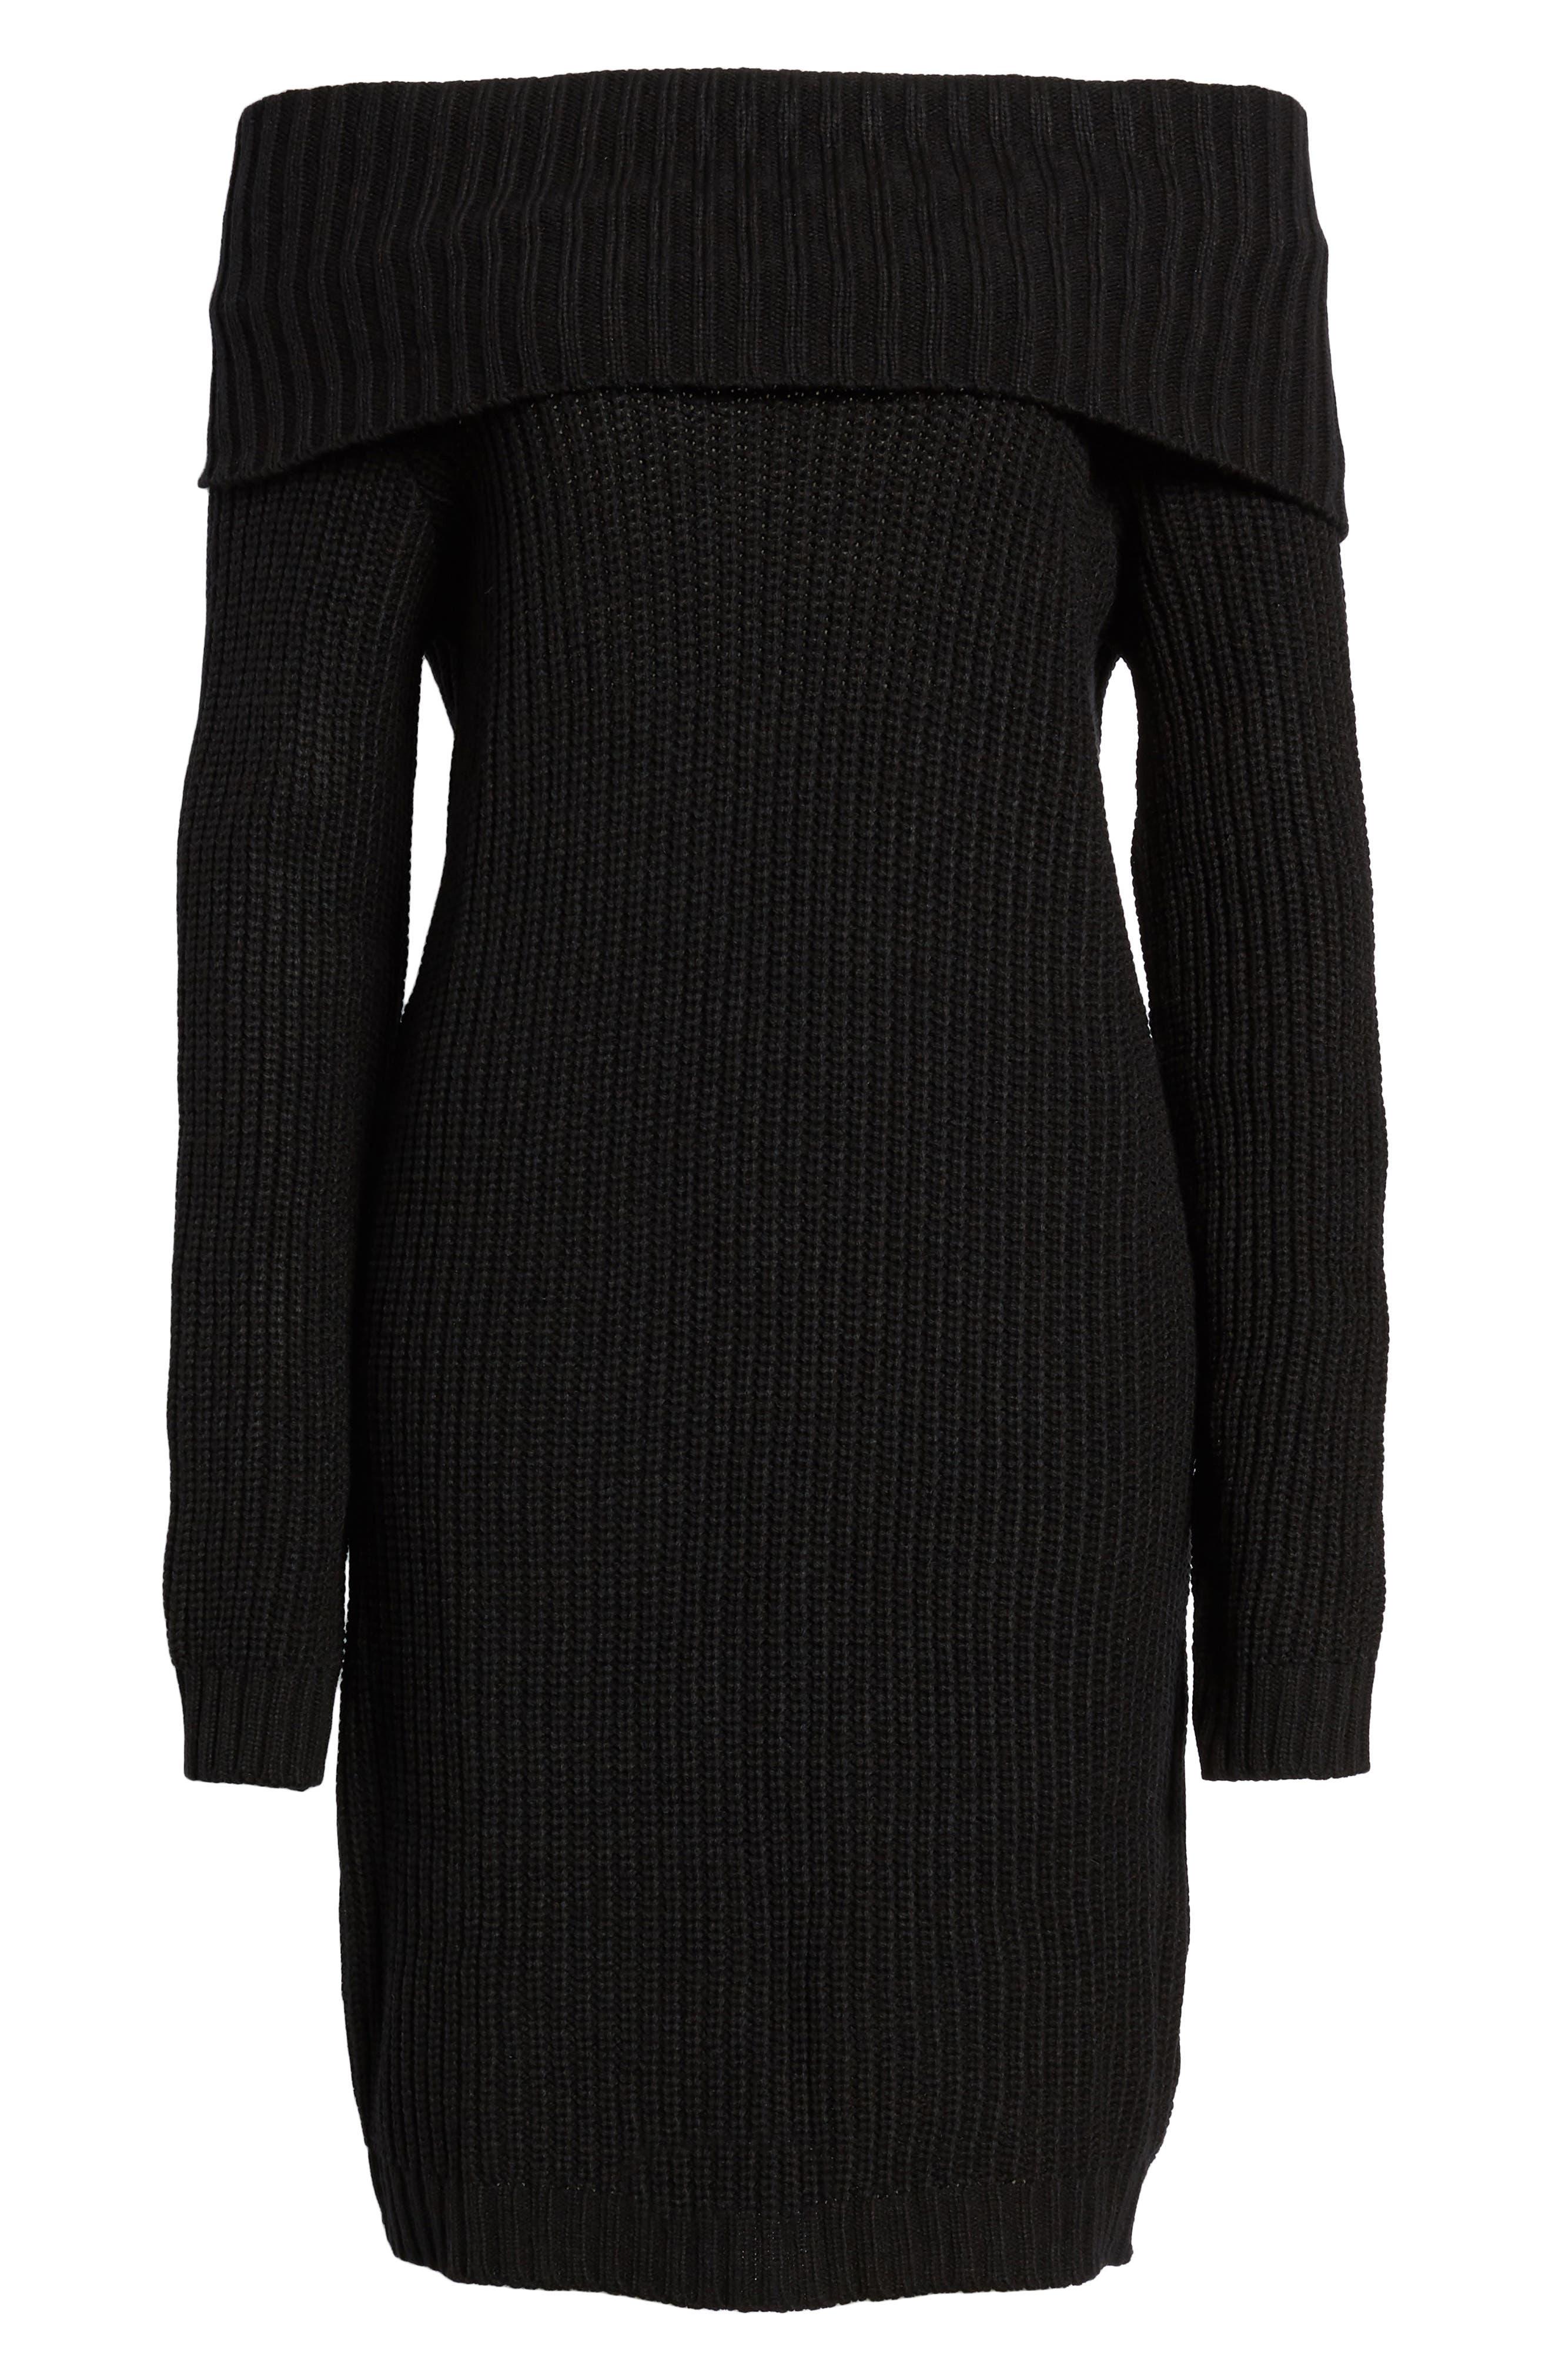 Foldover Off the Shoulder Sweater Dress,                             Alternate thumbnail 6, color,                             001